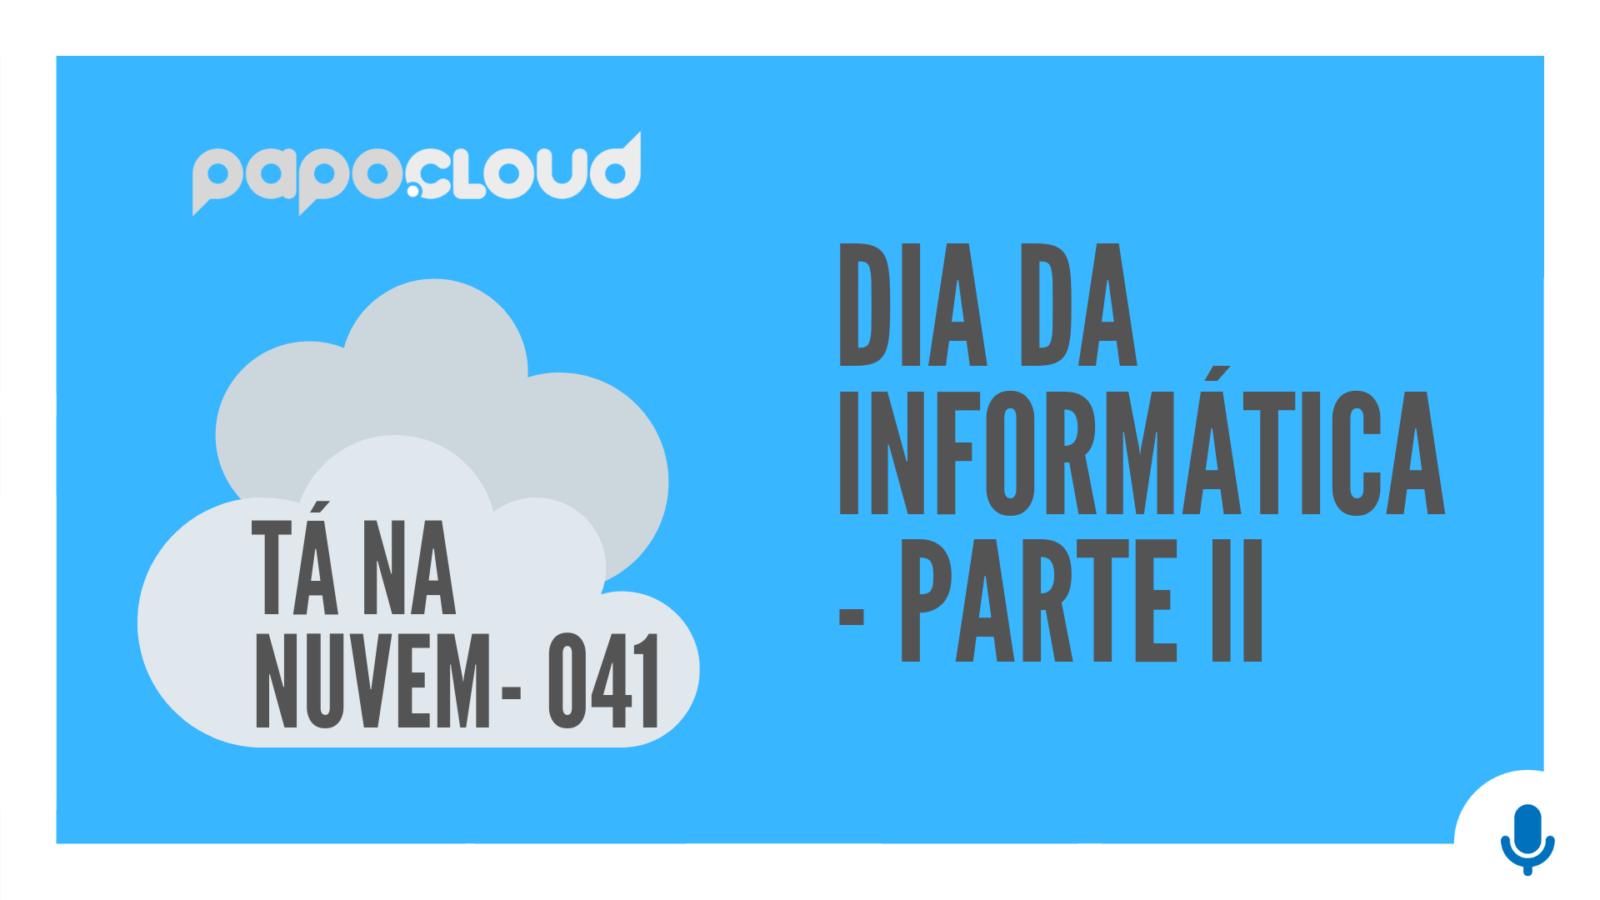 Tá Na Nuvem 041 - inforMÁTICA - PARTE II